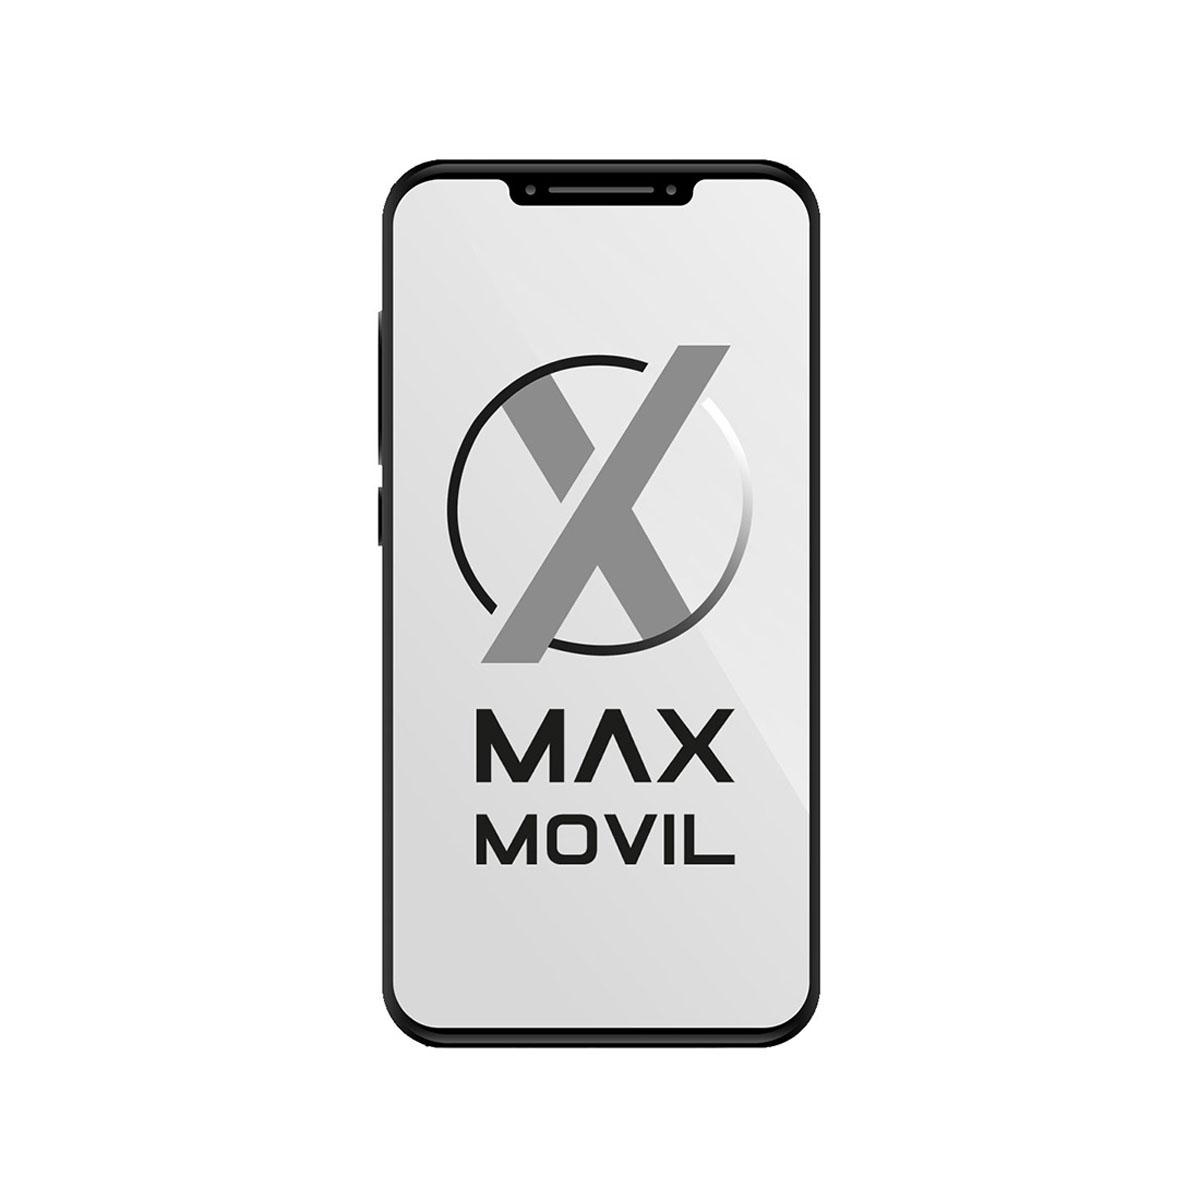 Samsung Galaxy S3 Mini i8190 NFC libre blanco